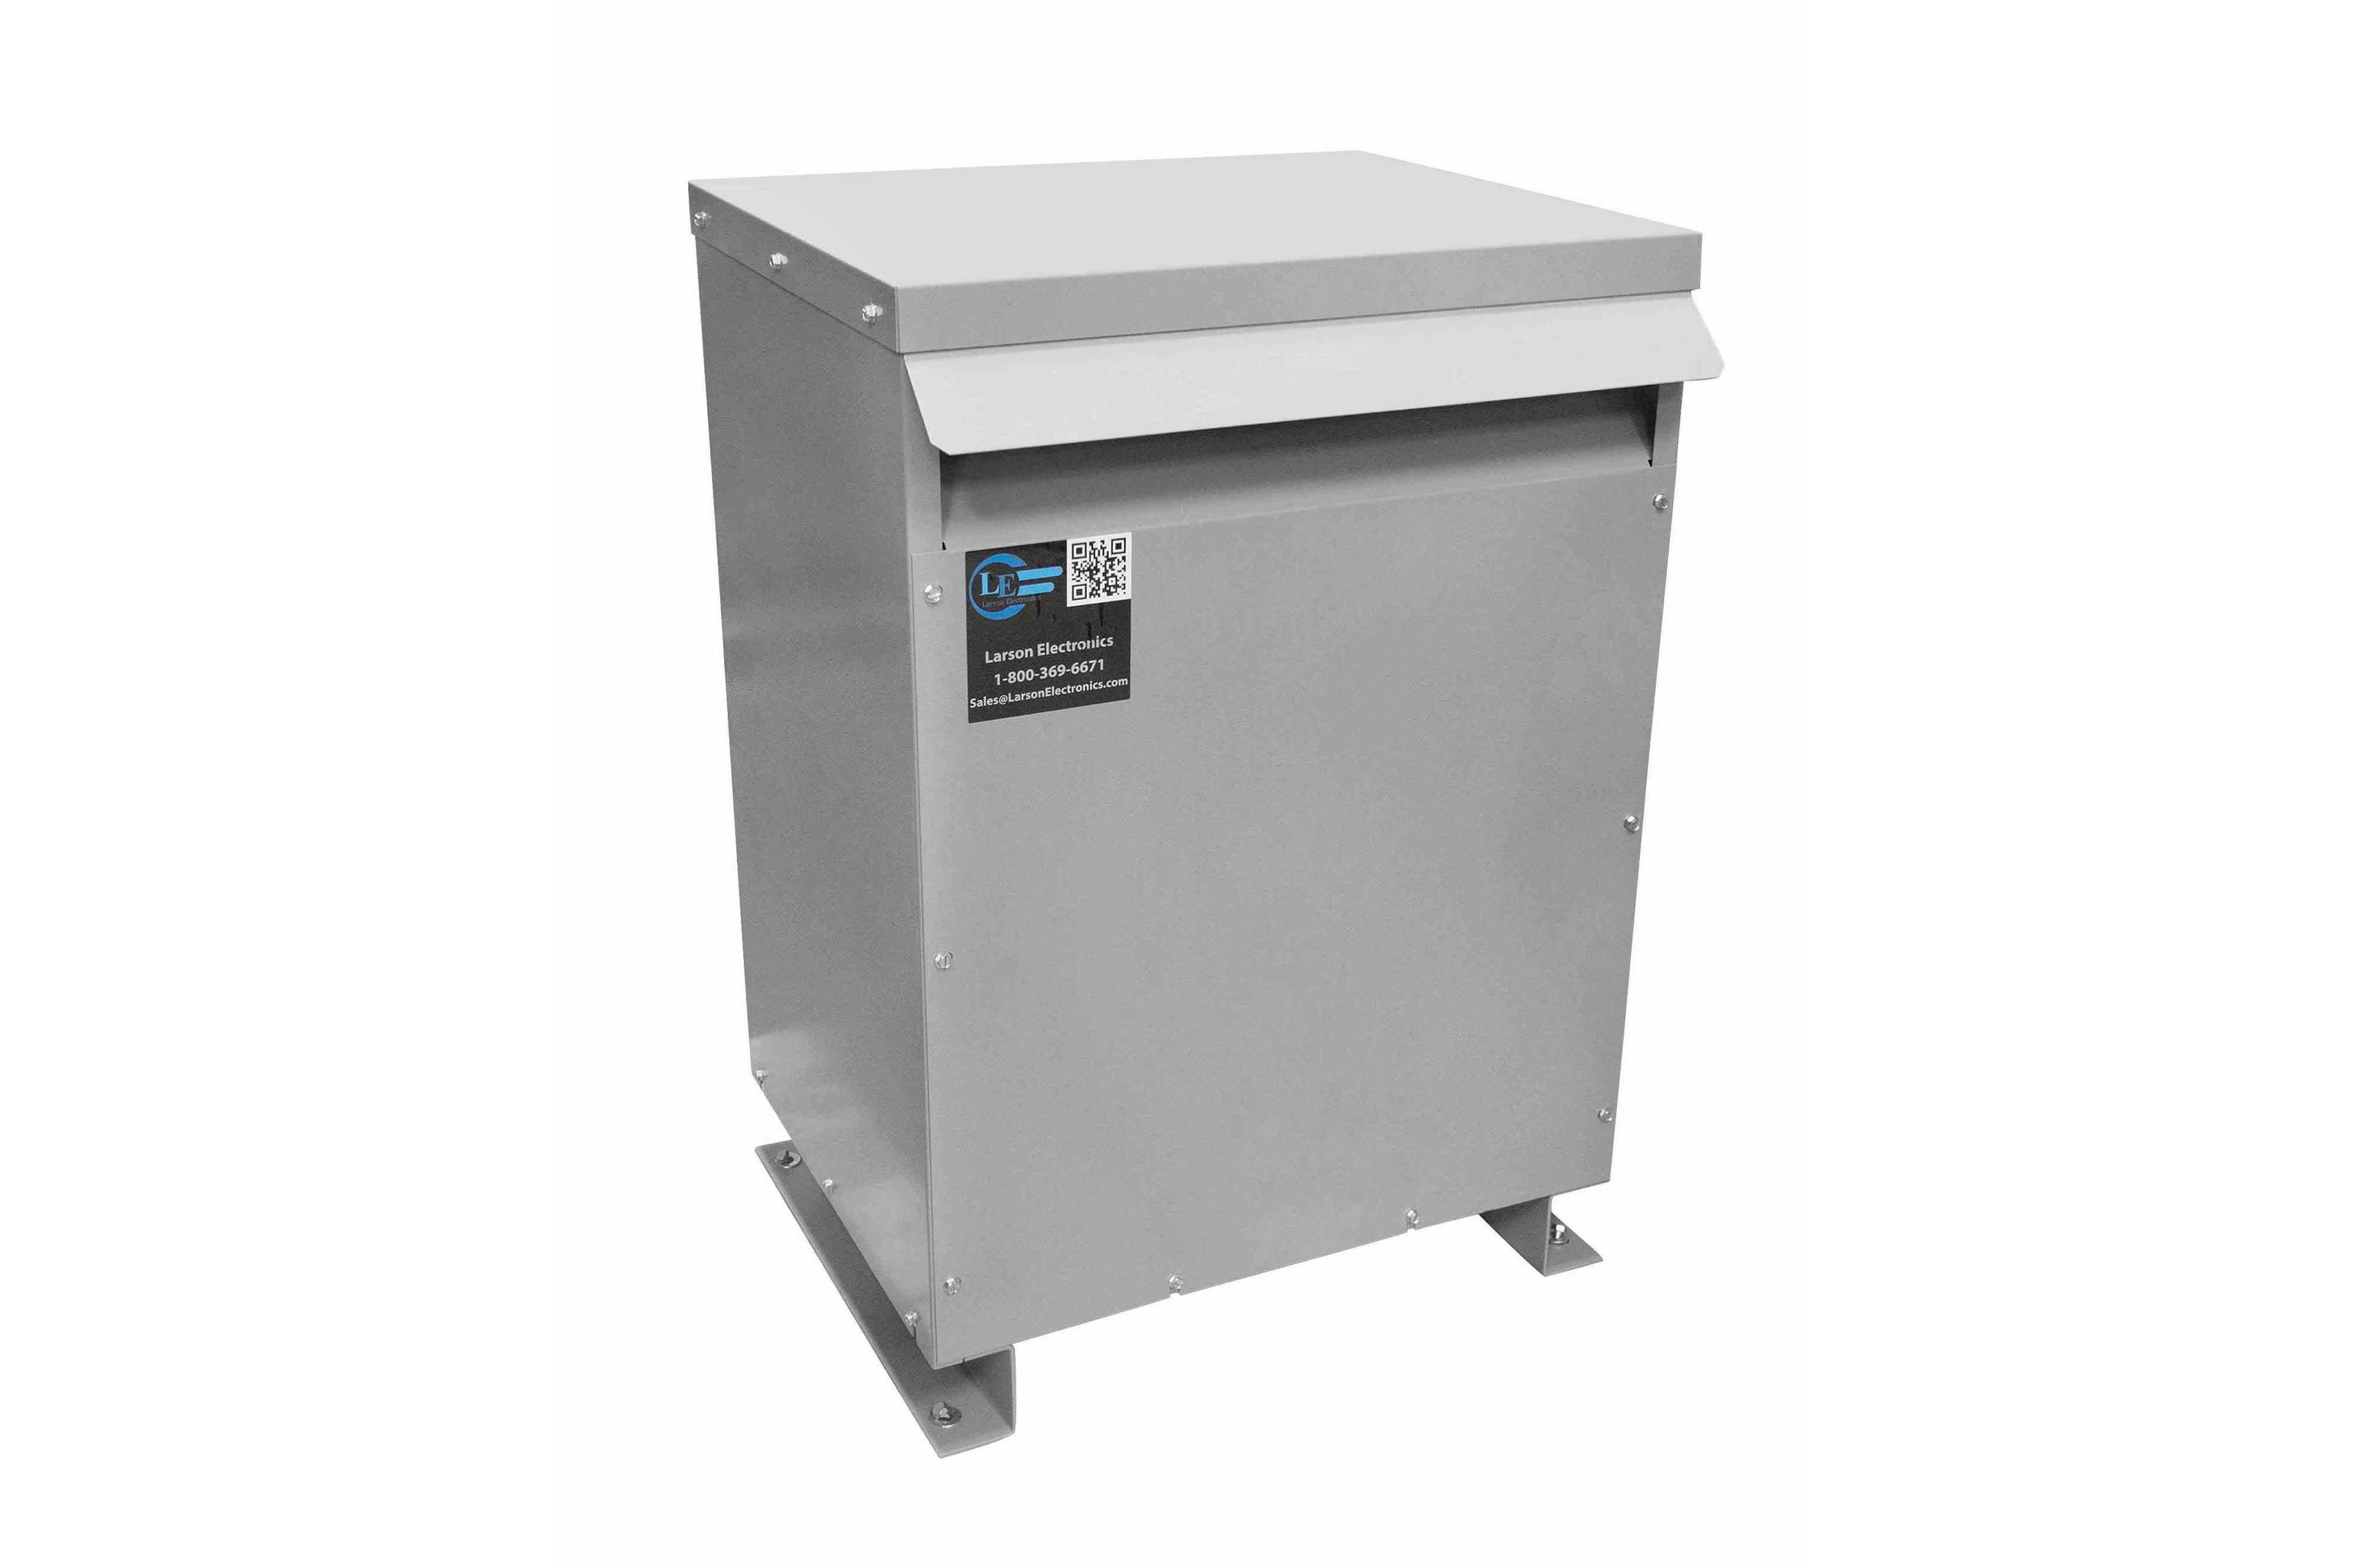 600 kVA 3PH Isolation Transformer, 600V Wye Primary, 400V Delta Secondary, N3R, Ventilated, 60 Hz